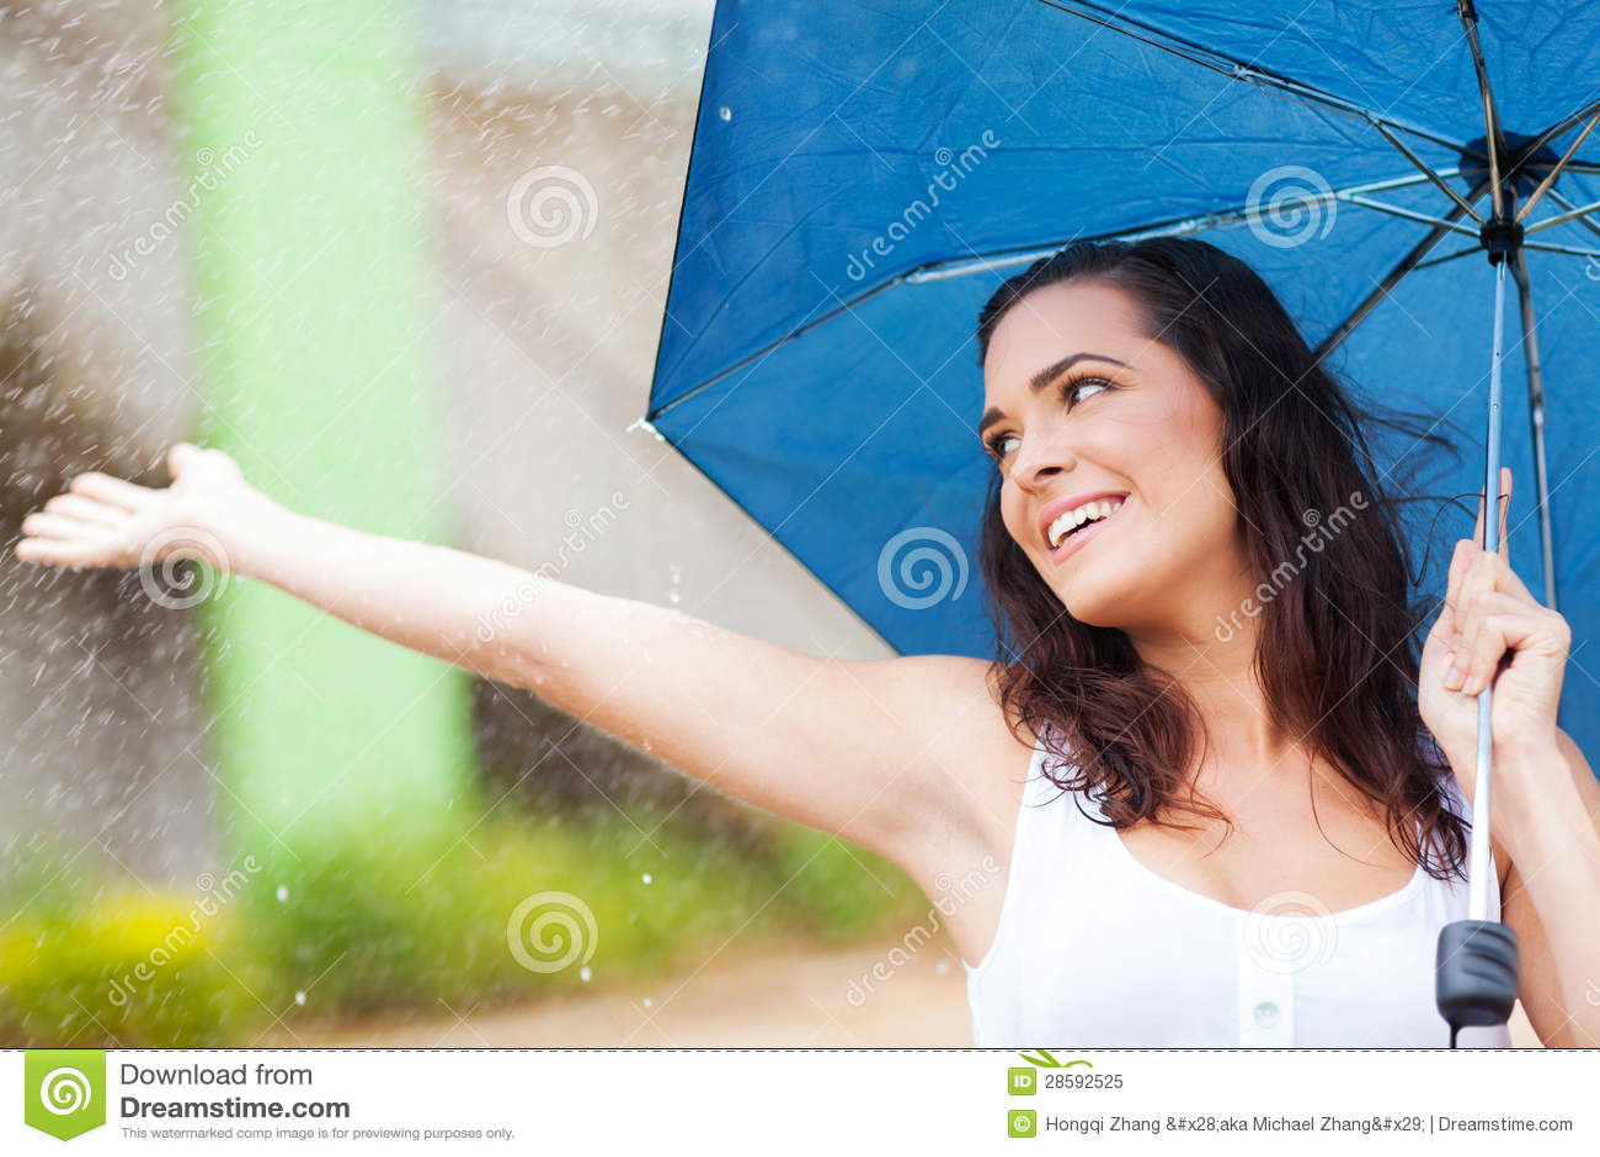 Divertirse en lluvia